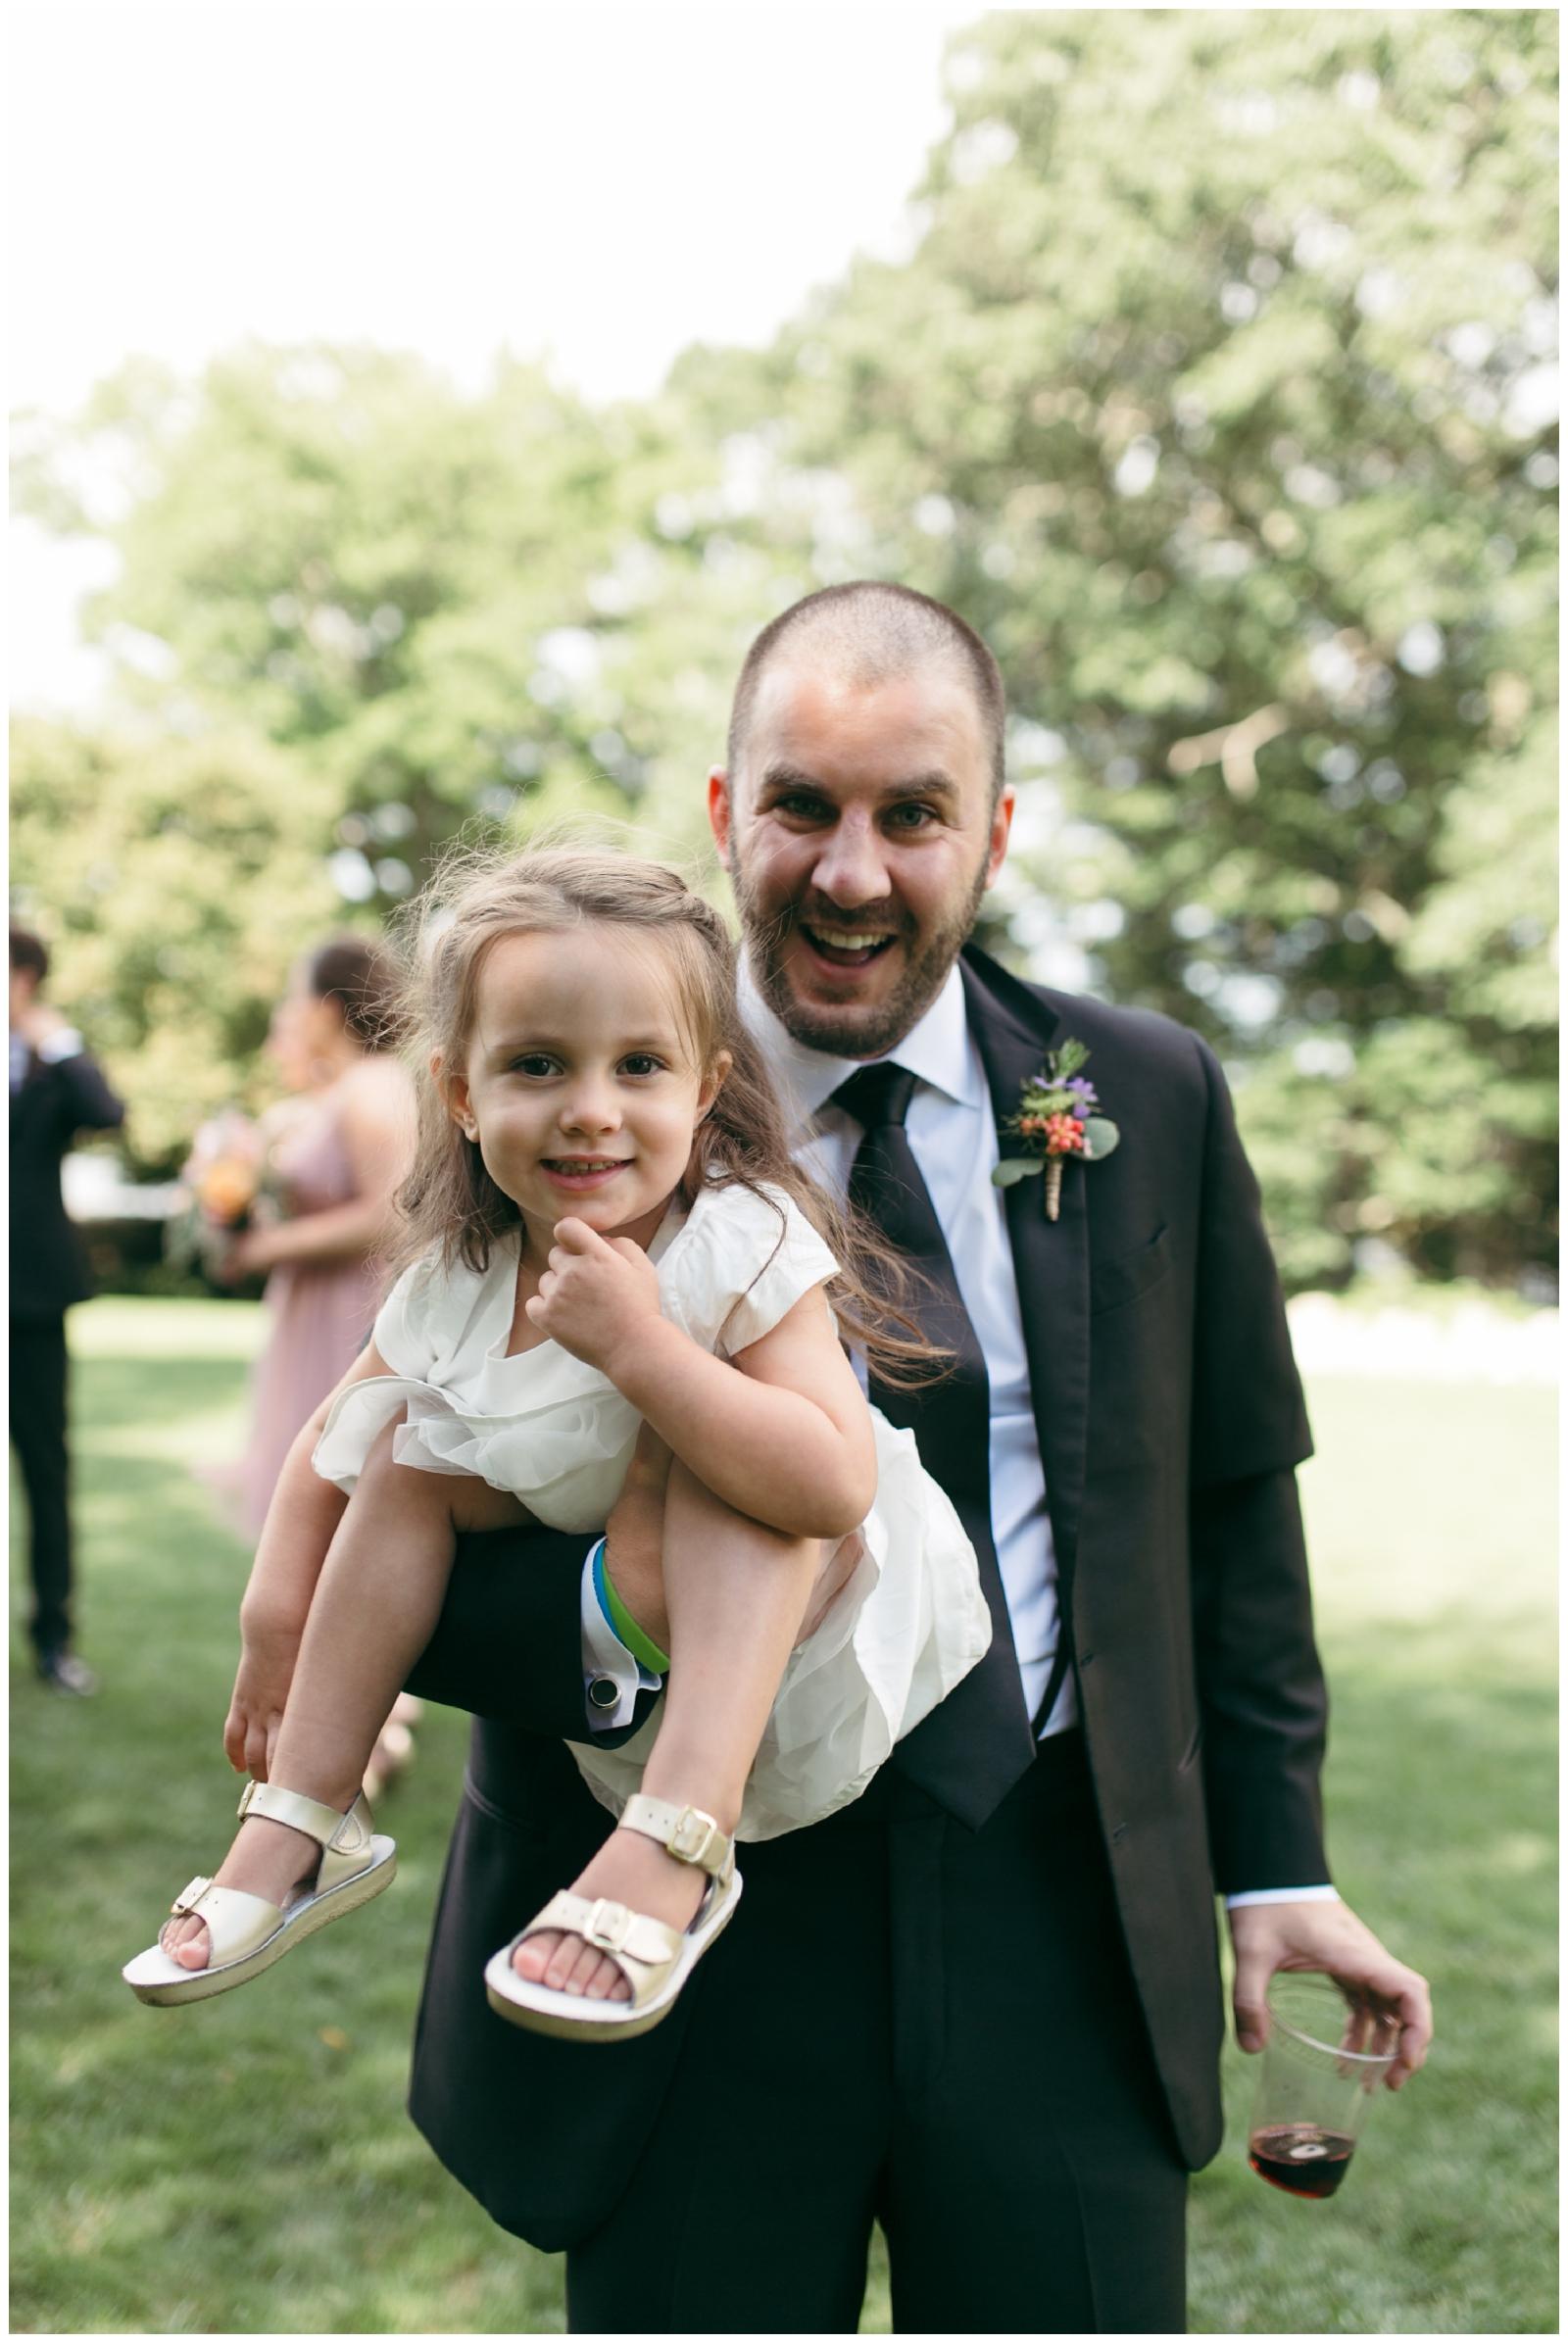 Moraine-Farm-wedding-Bailey-Q-Photo-Massachusetts-wedding-photpgrapher-043.jpg